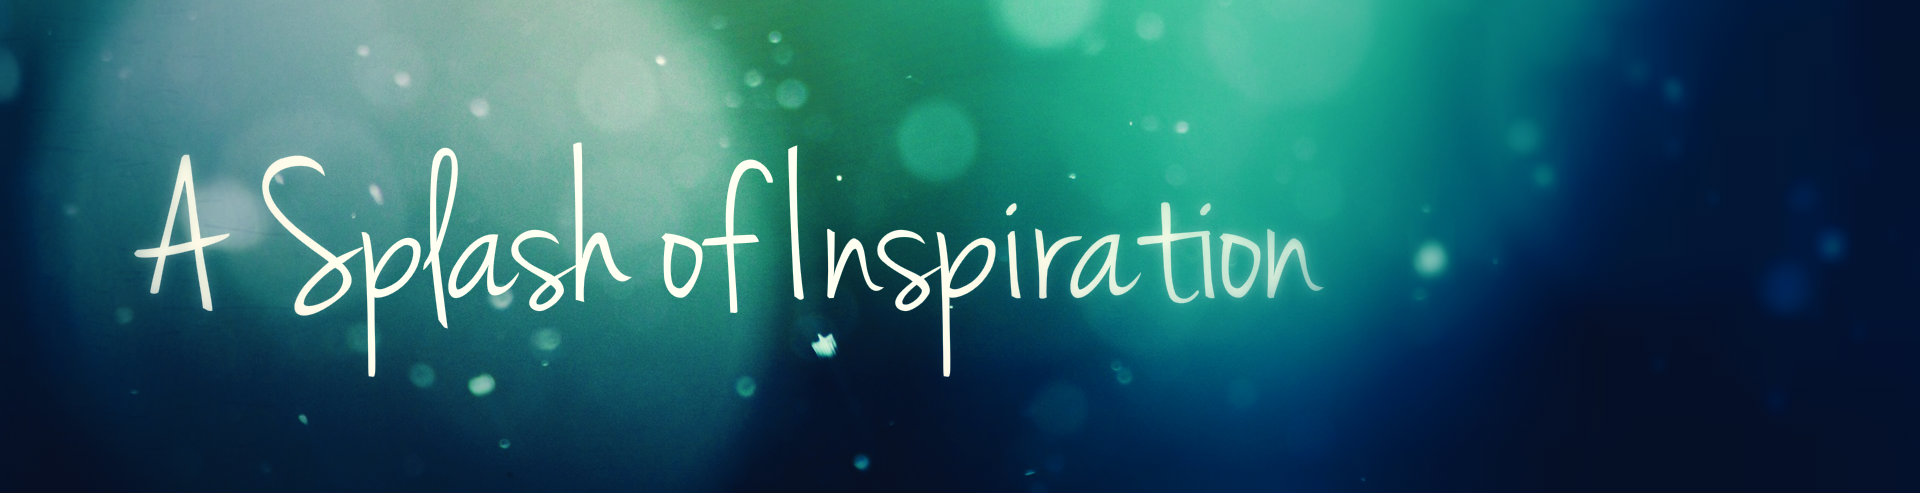 Headers | A Splash of Inspiration